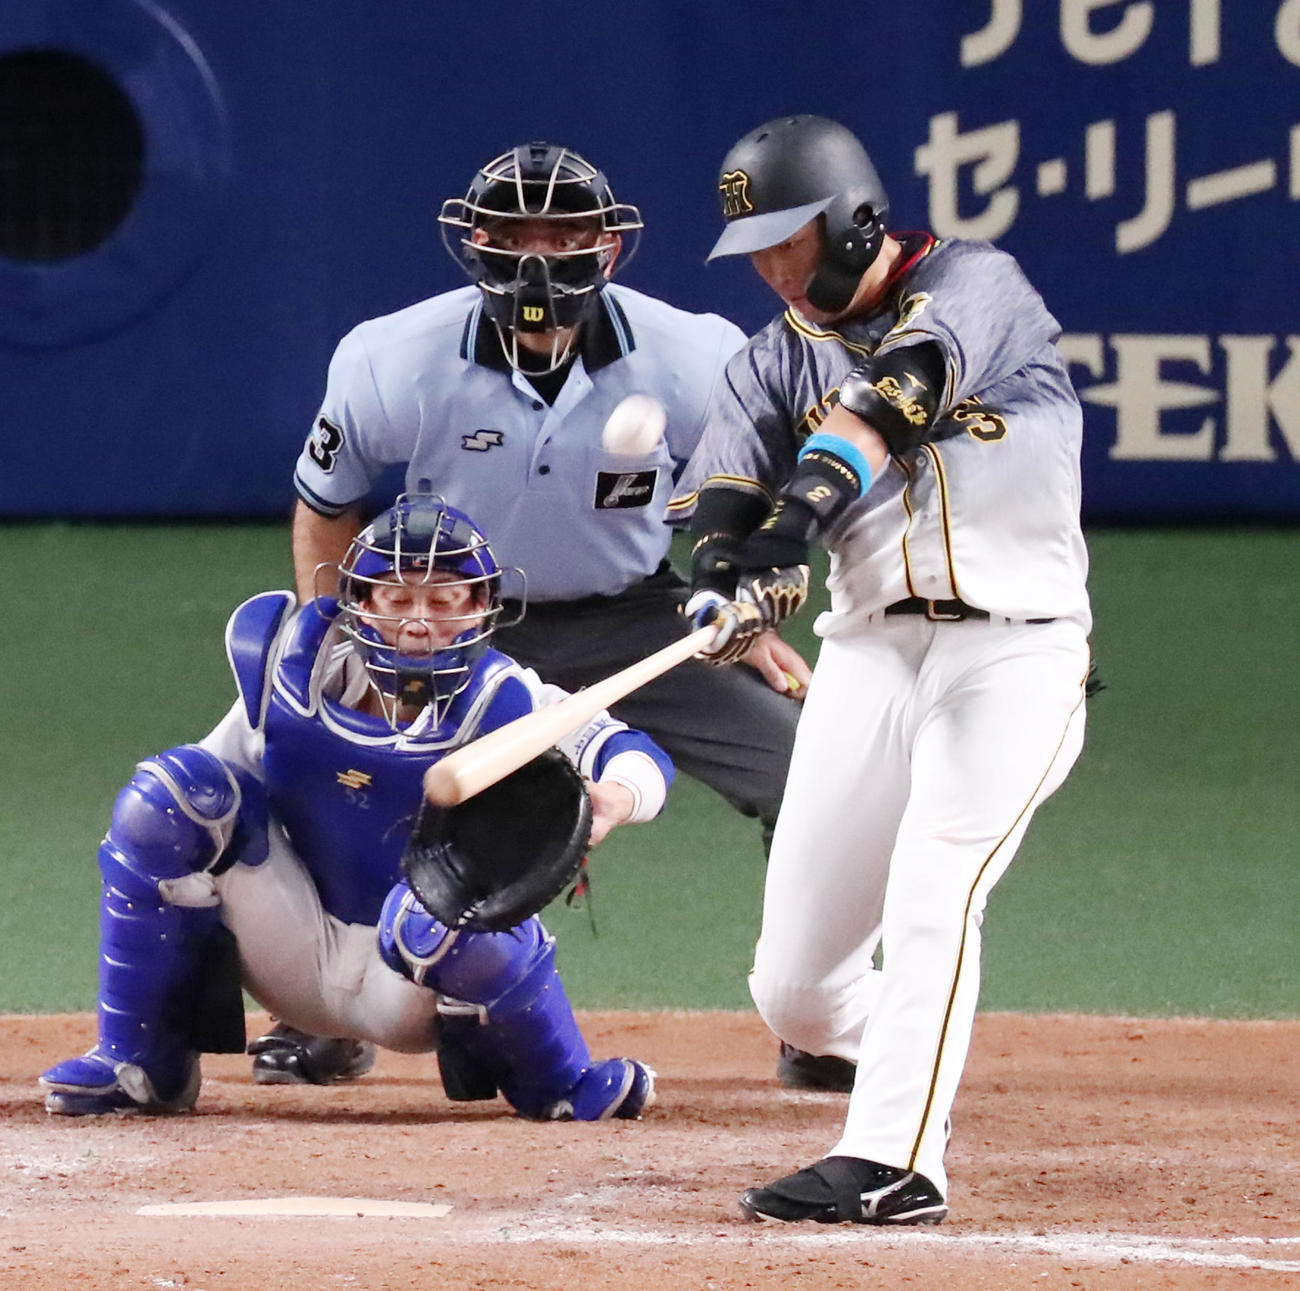 中日対阪神 9回表阪神無死二塁、大山は左越え2点本塁打を放つ(撮影・加藤哉)